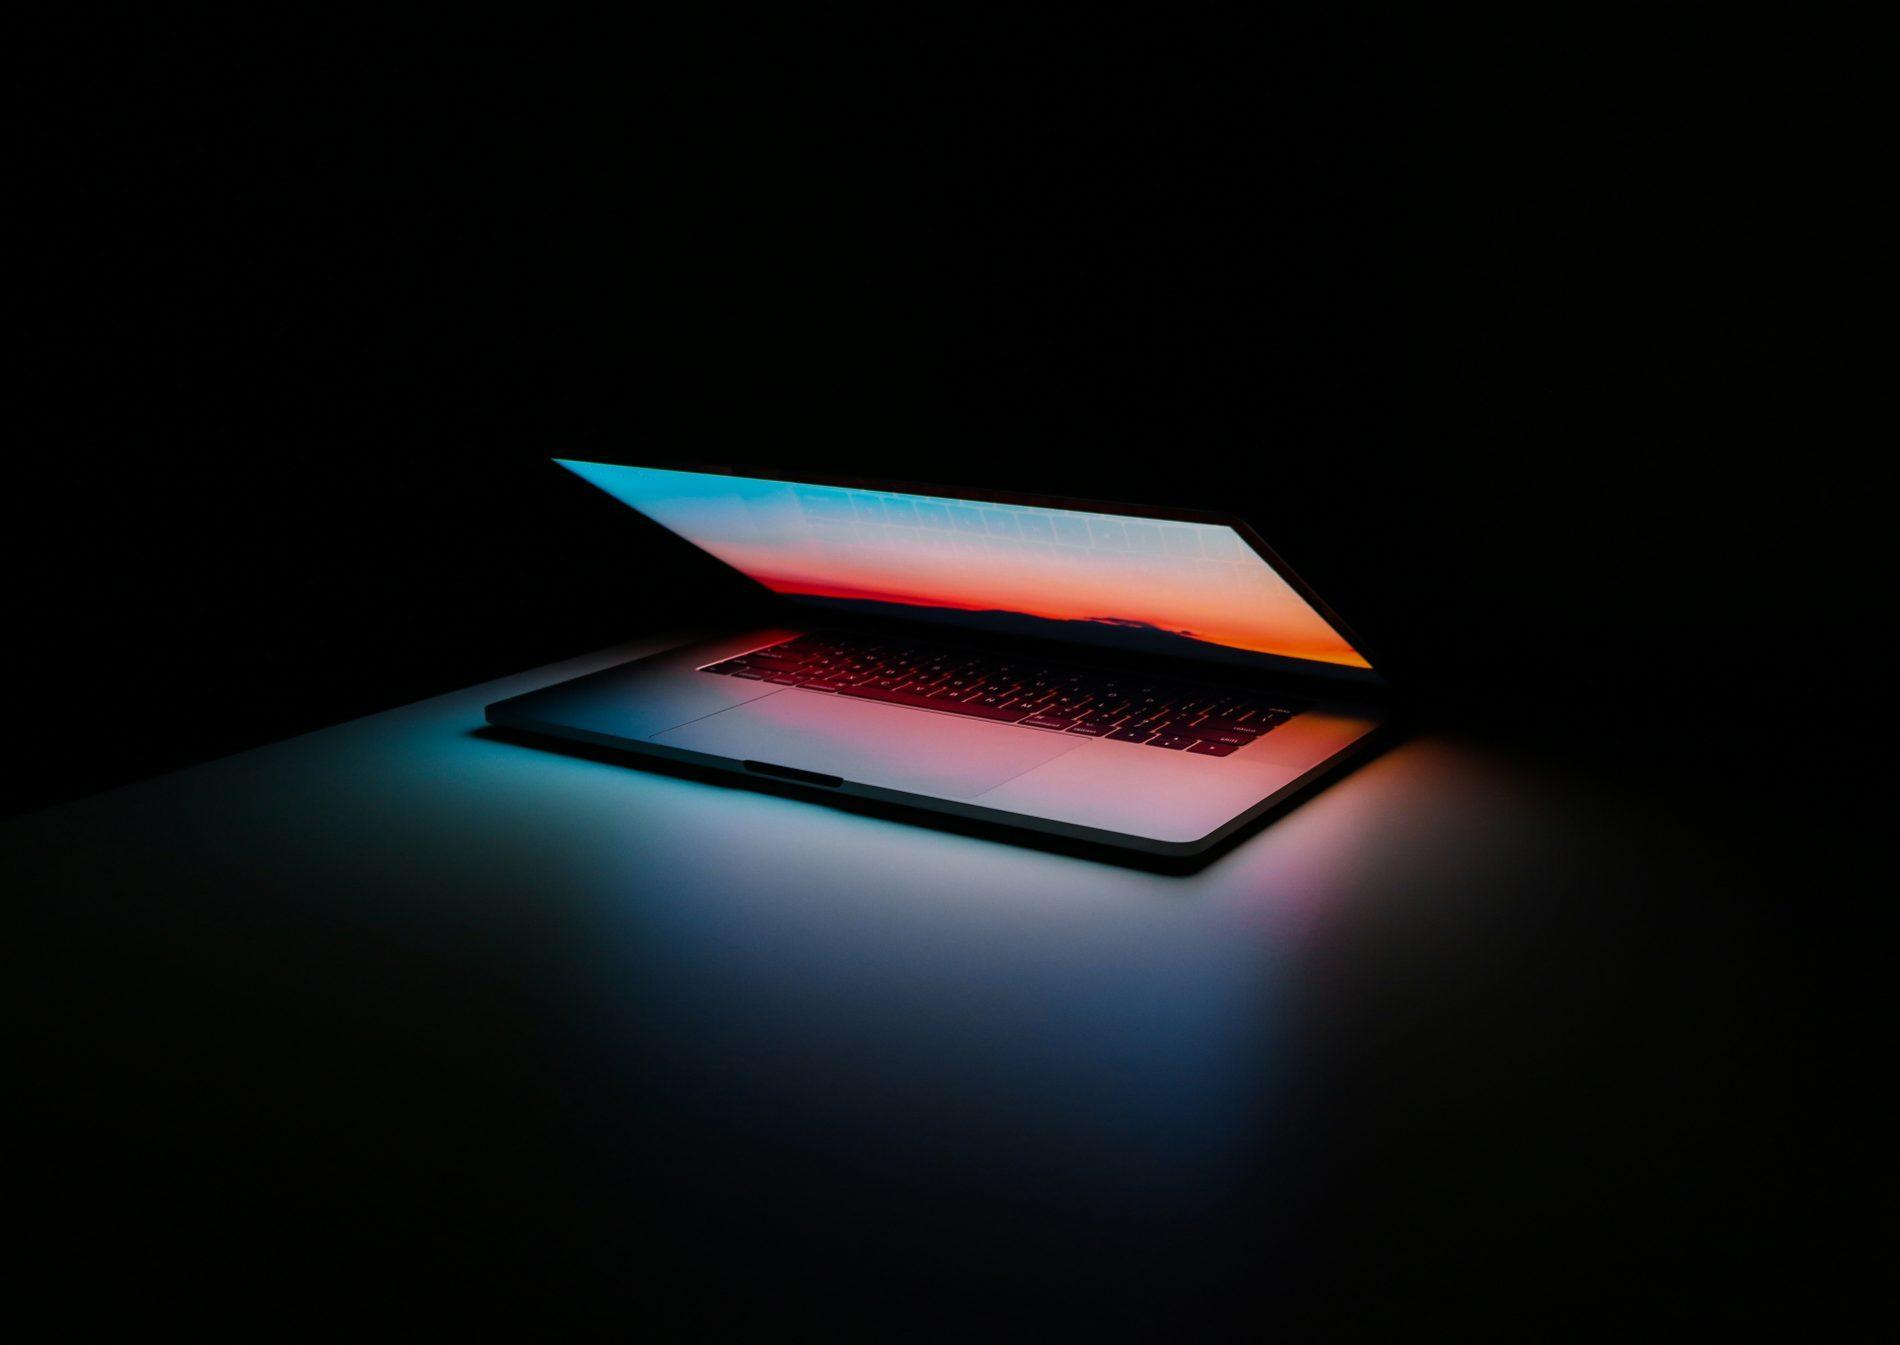 Do we shape technology, or does it shape us?